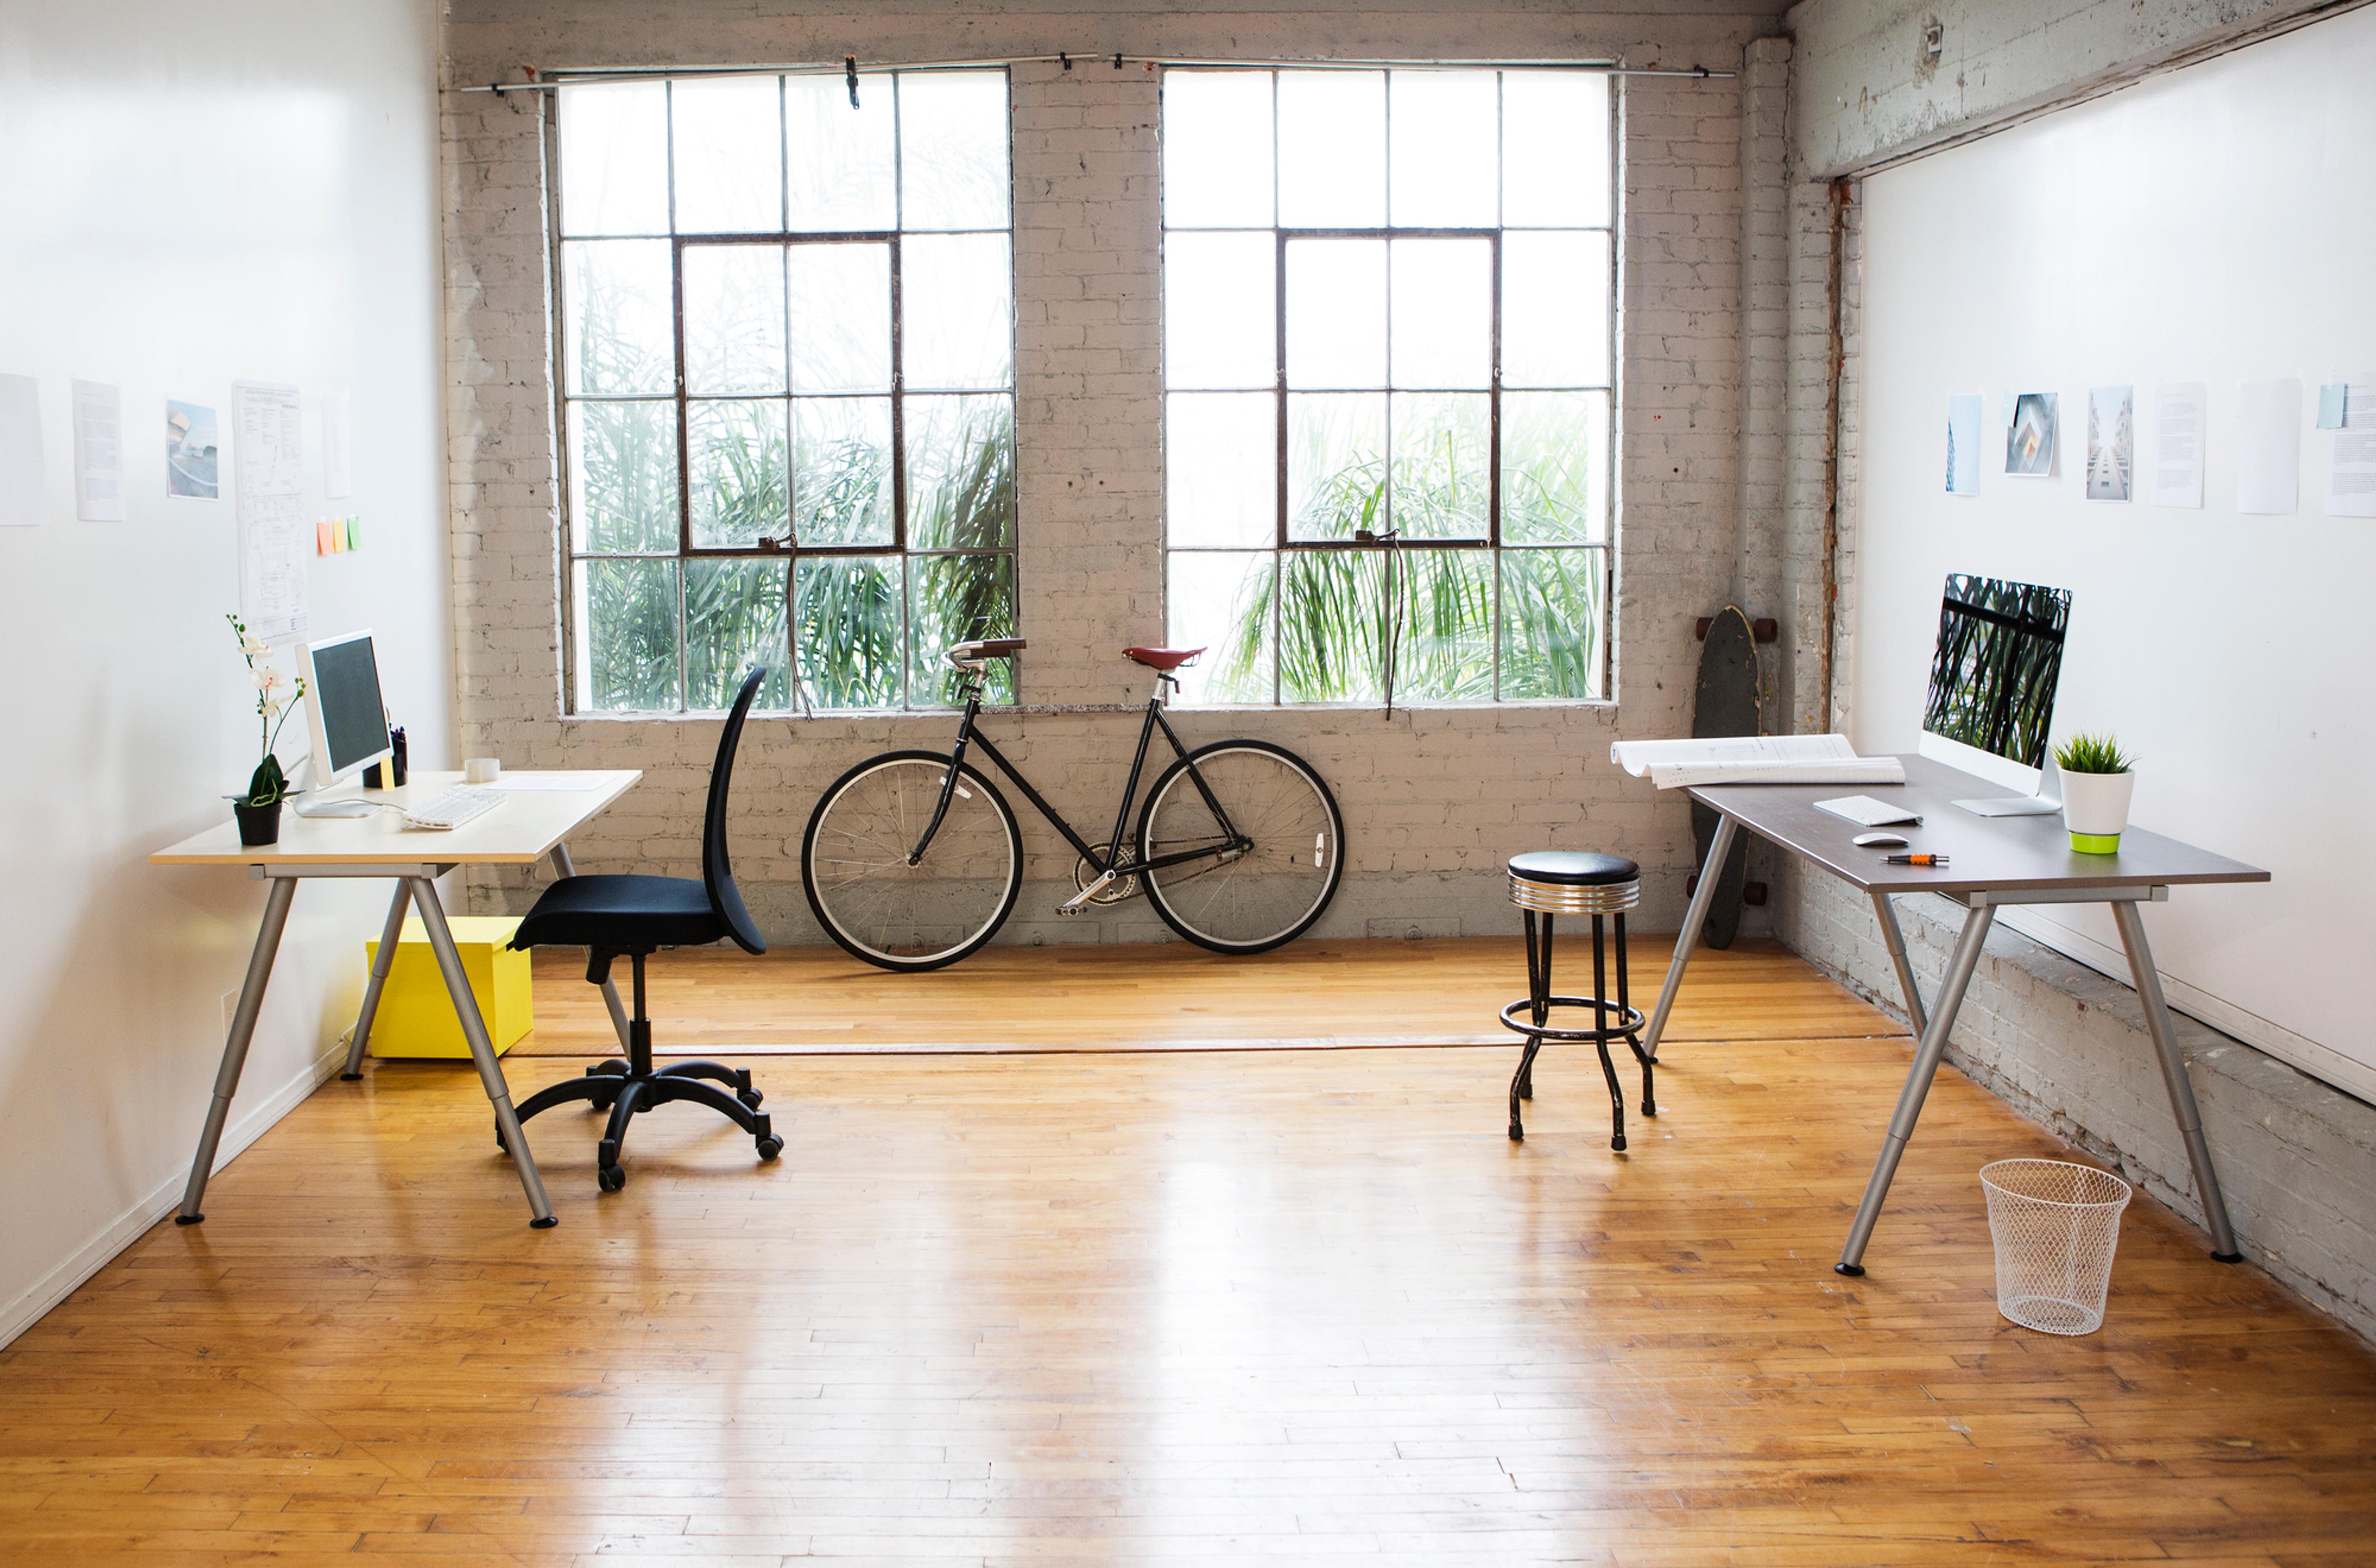 Residential/Commercial Flooring